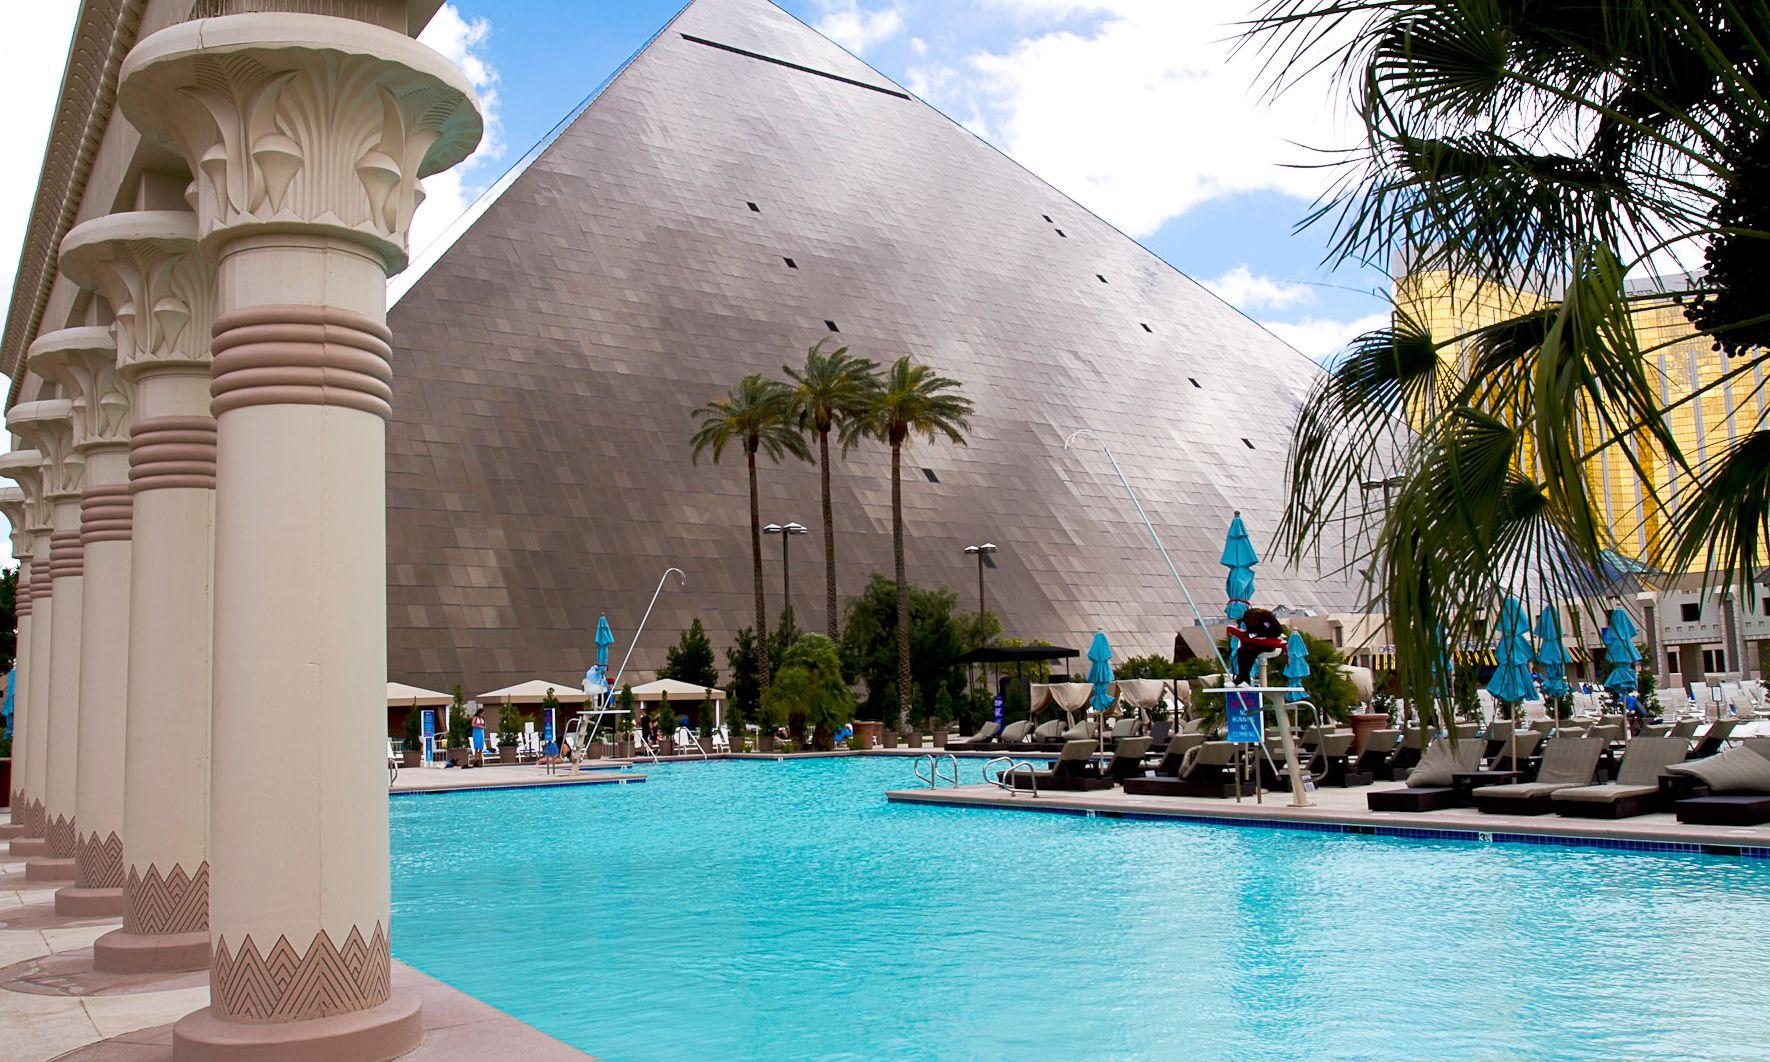 Luxor Hotel And Casino - Las Vegas Nv In 2019 Urban